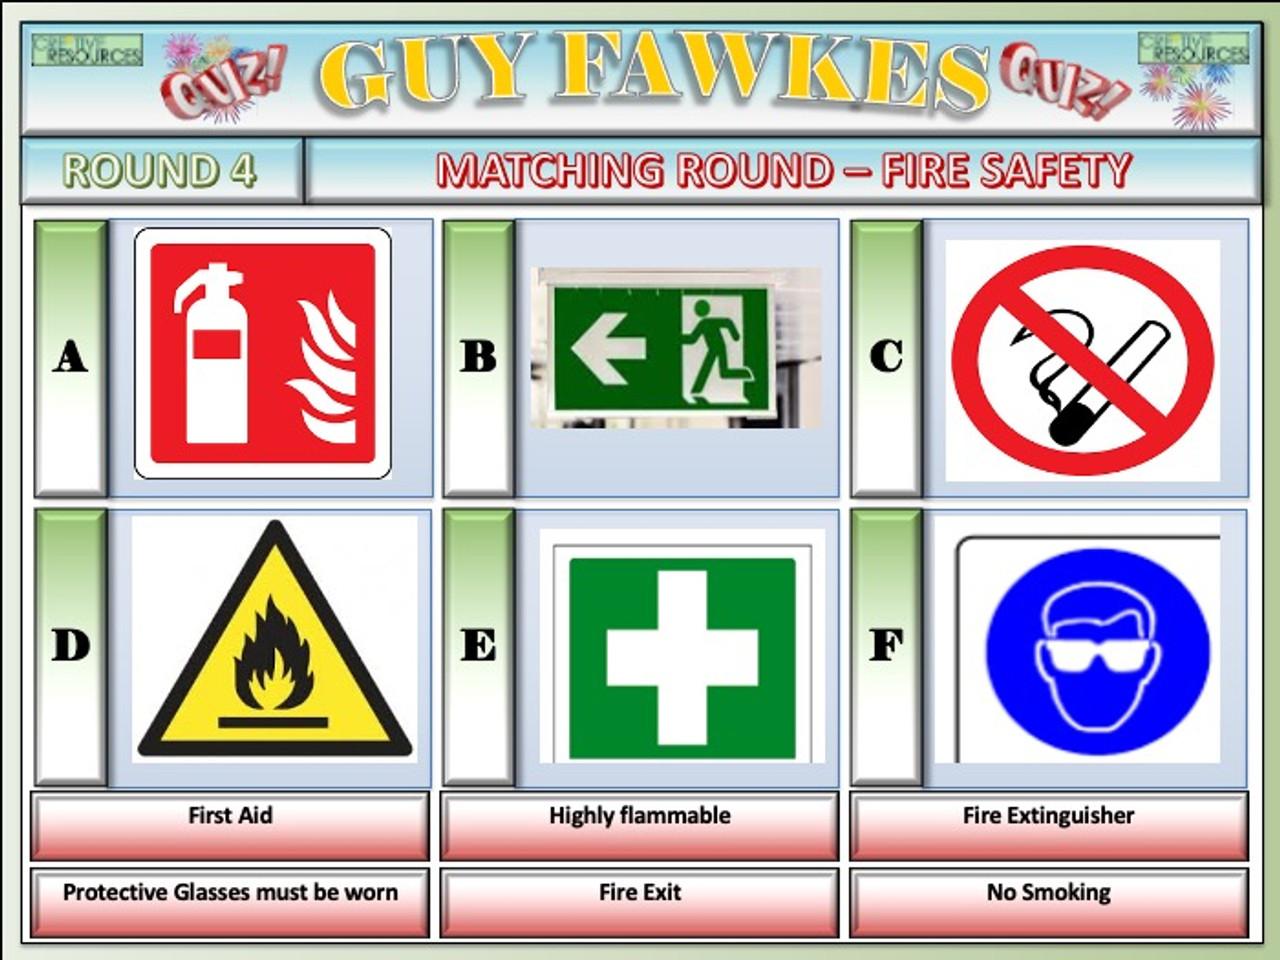 Guy Fawkes Night Fireworks Quiz